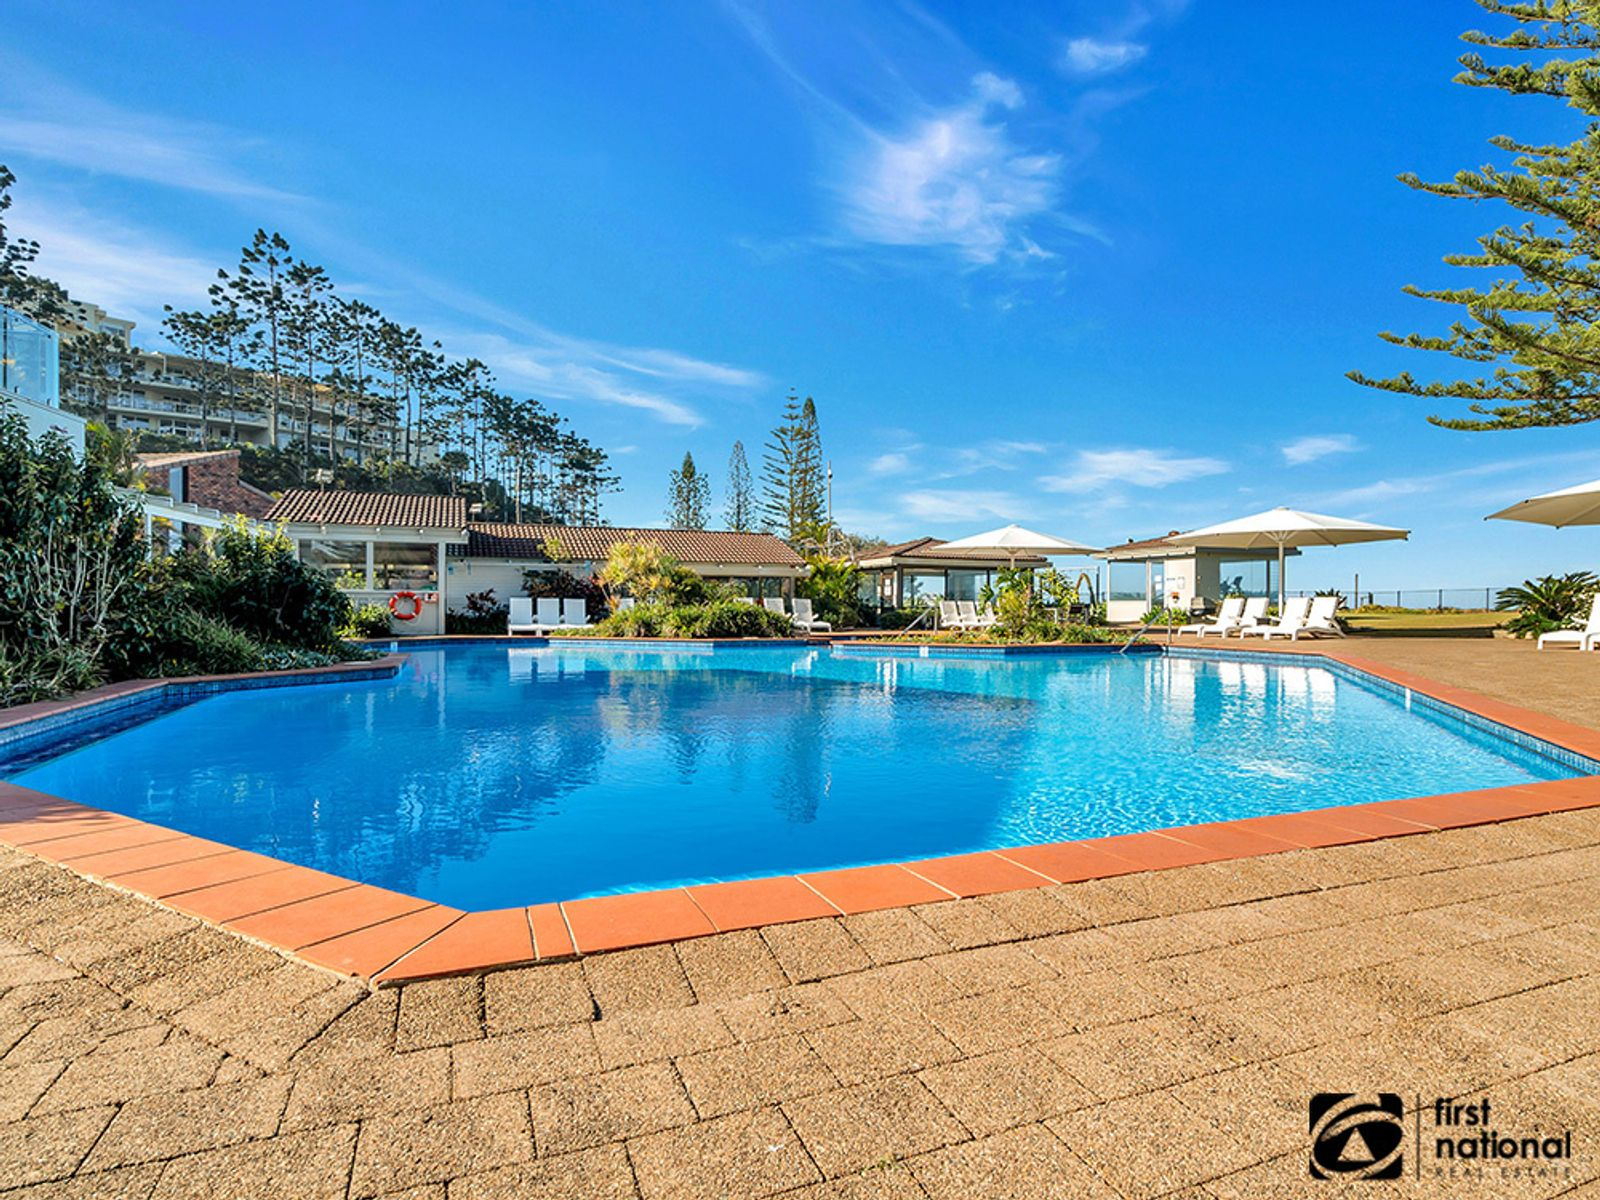 111/8 Solitary Islands Way, Sapphire Beach, NSW 2450